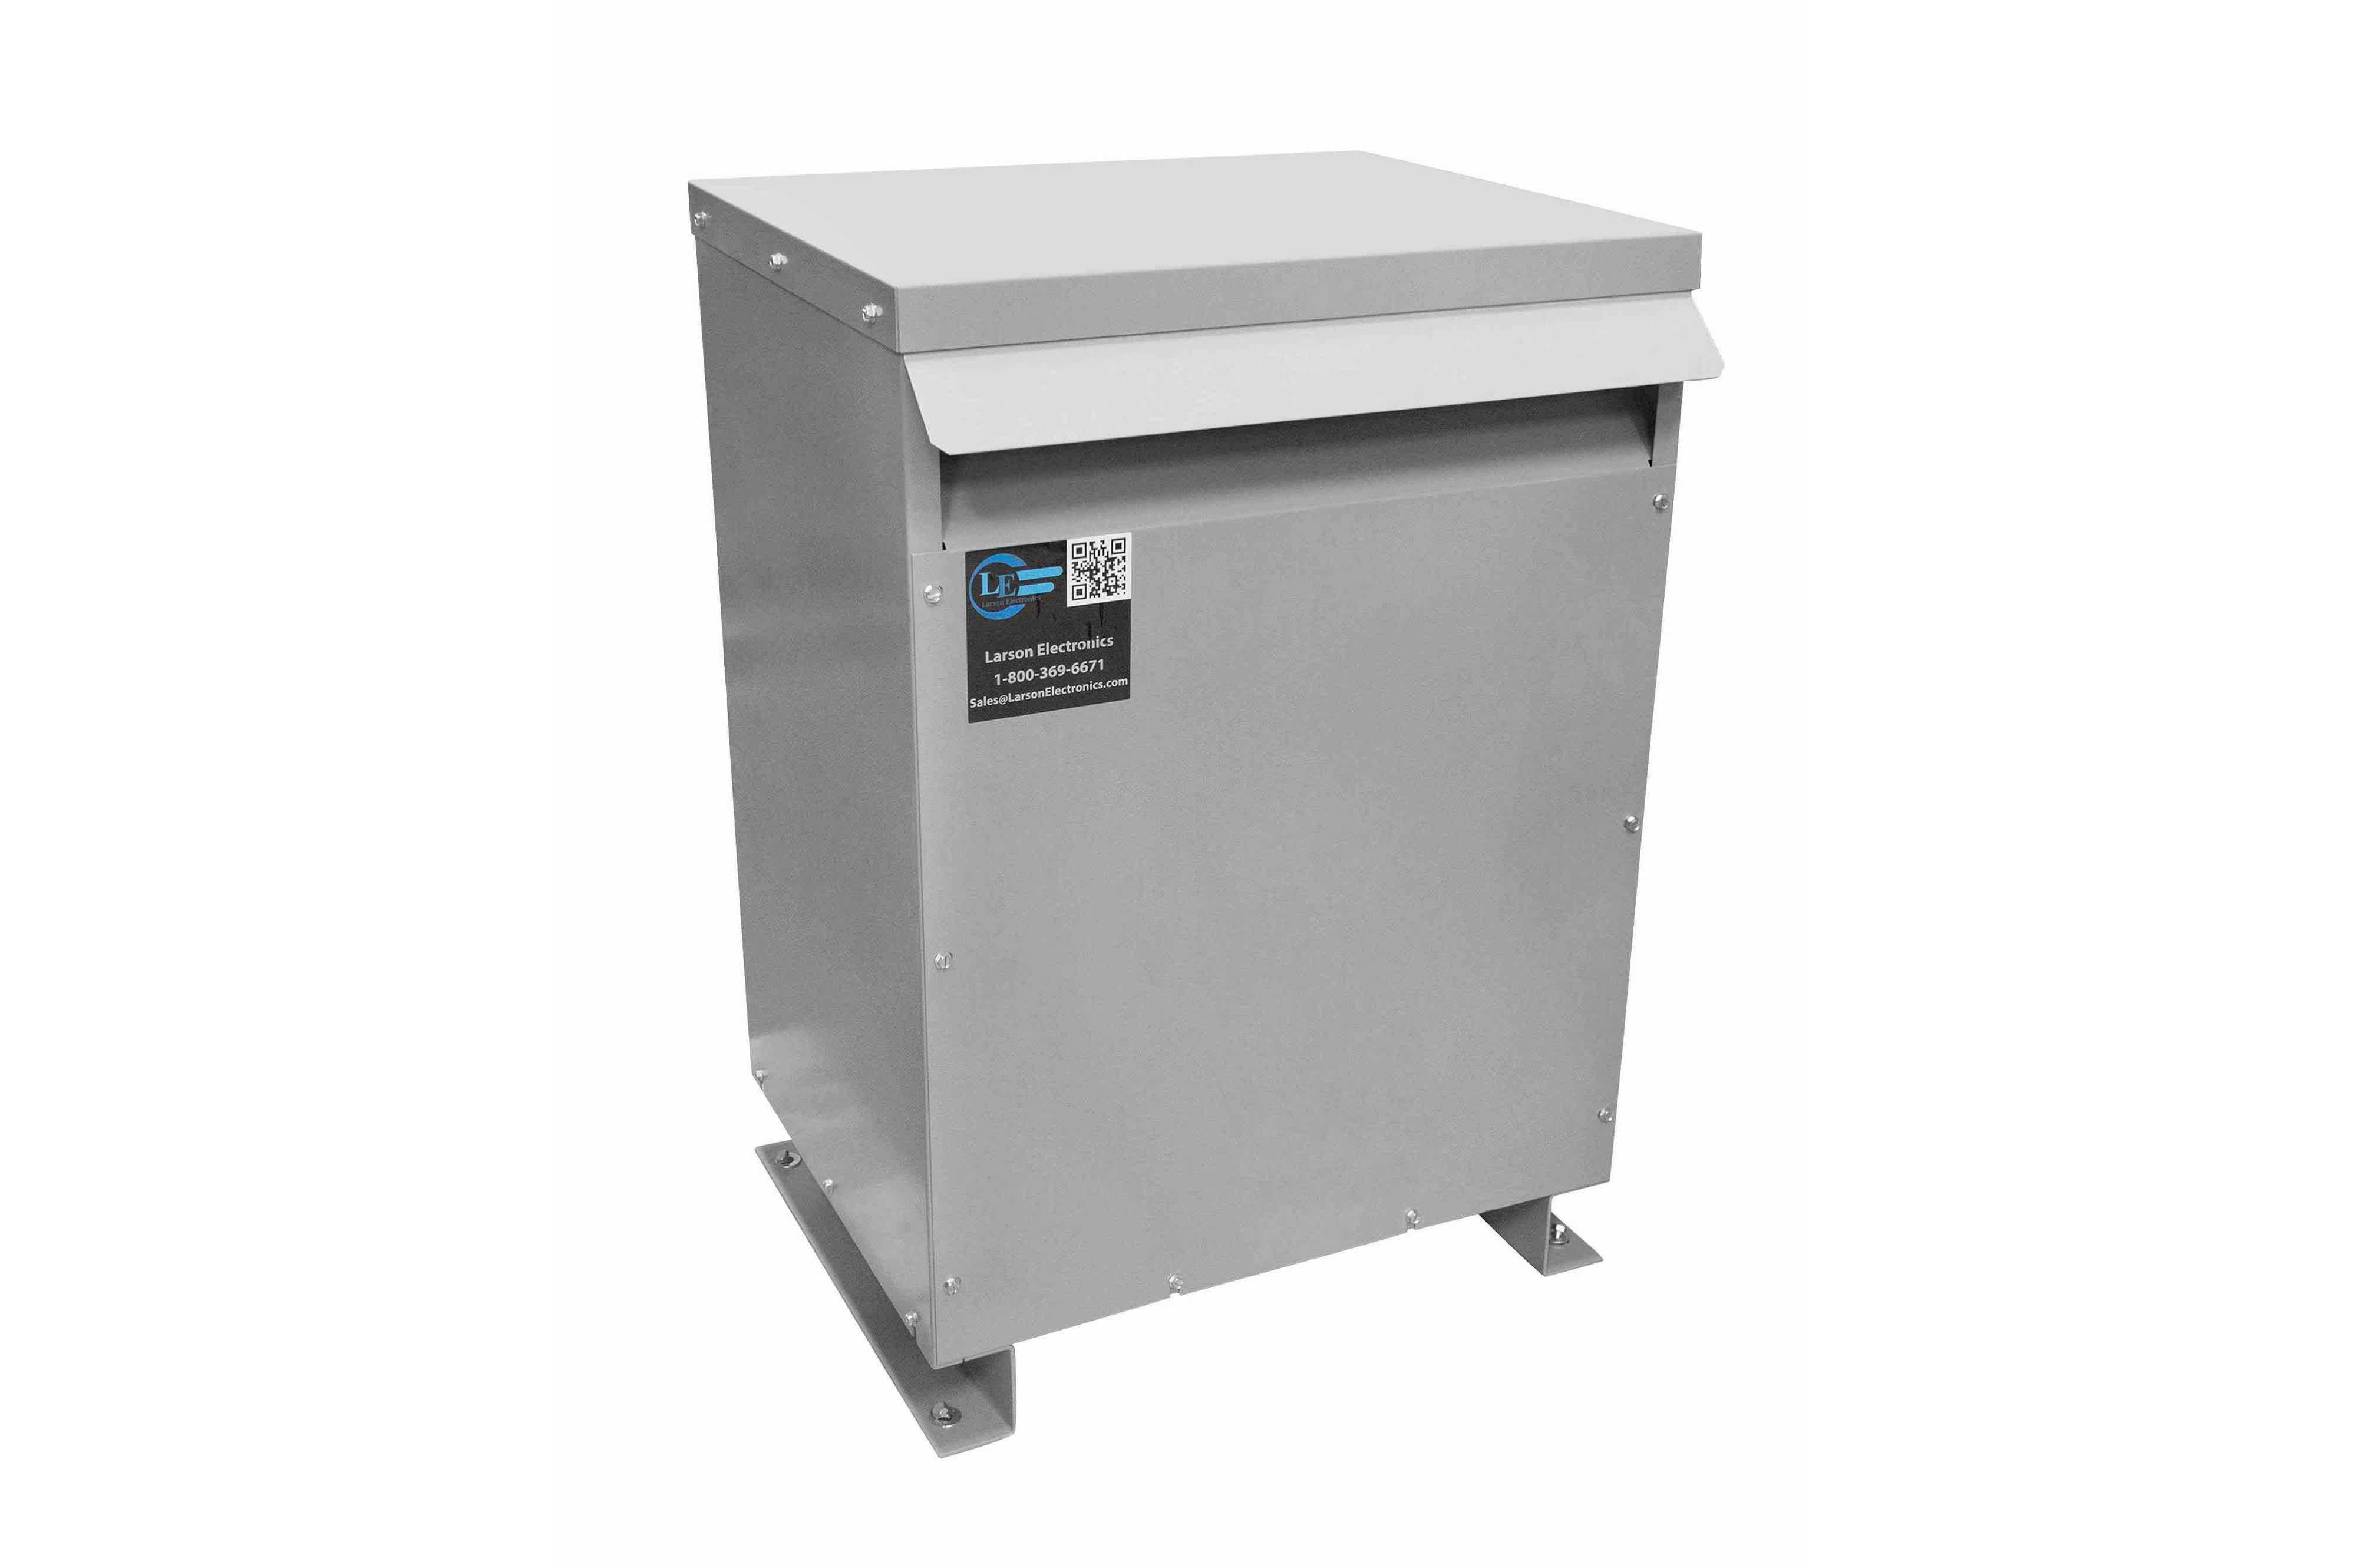 50 kVA 3PH DOE Transformer, 240V Delta Primary, 208Y/120 Wye-N Secondary, N3R, Ventilated, 60 Hz